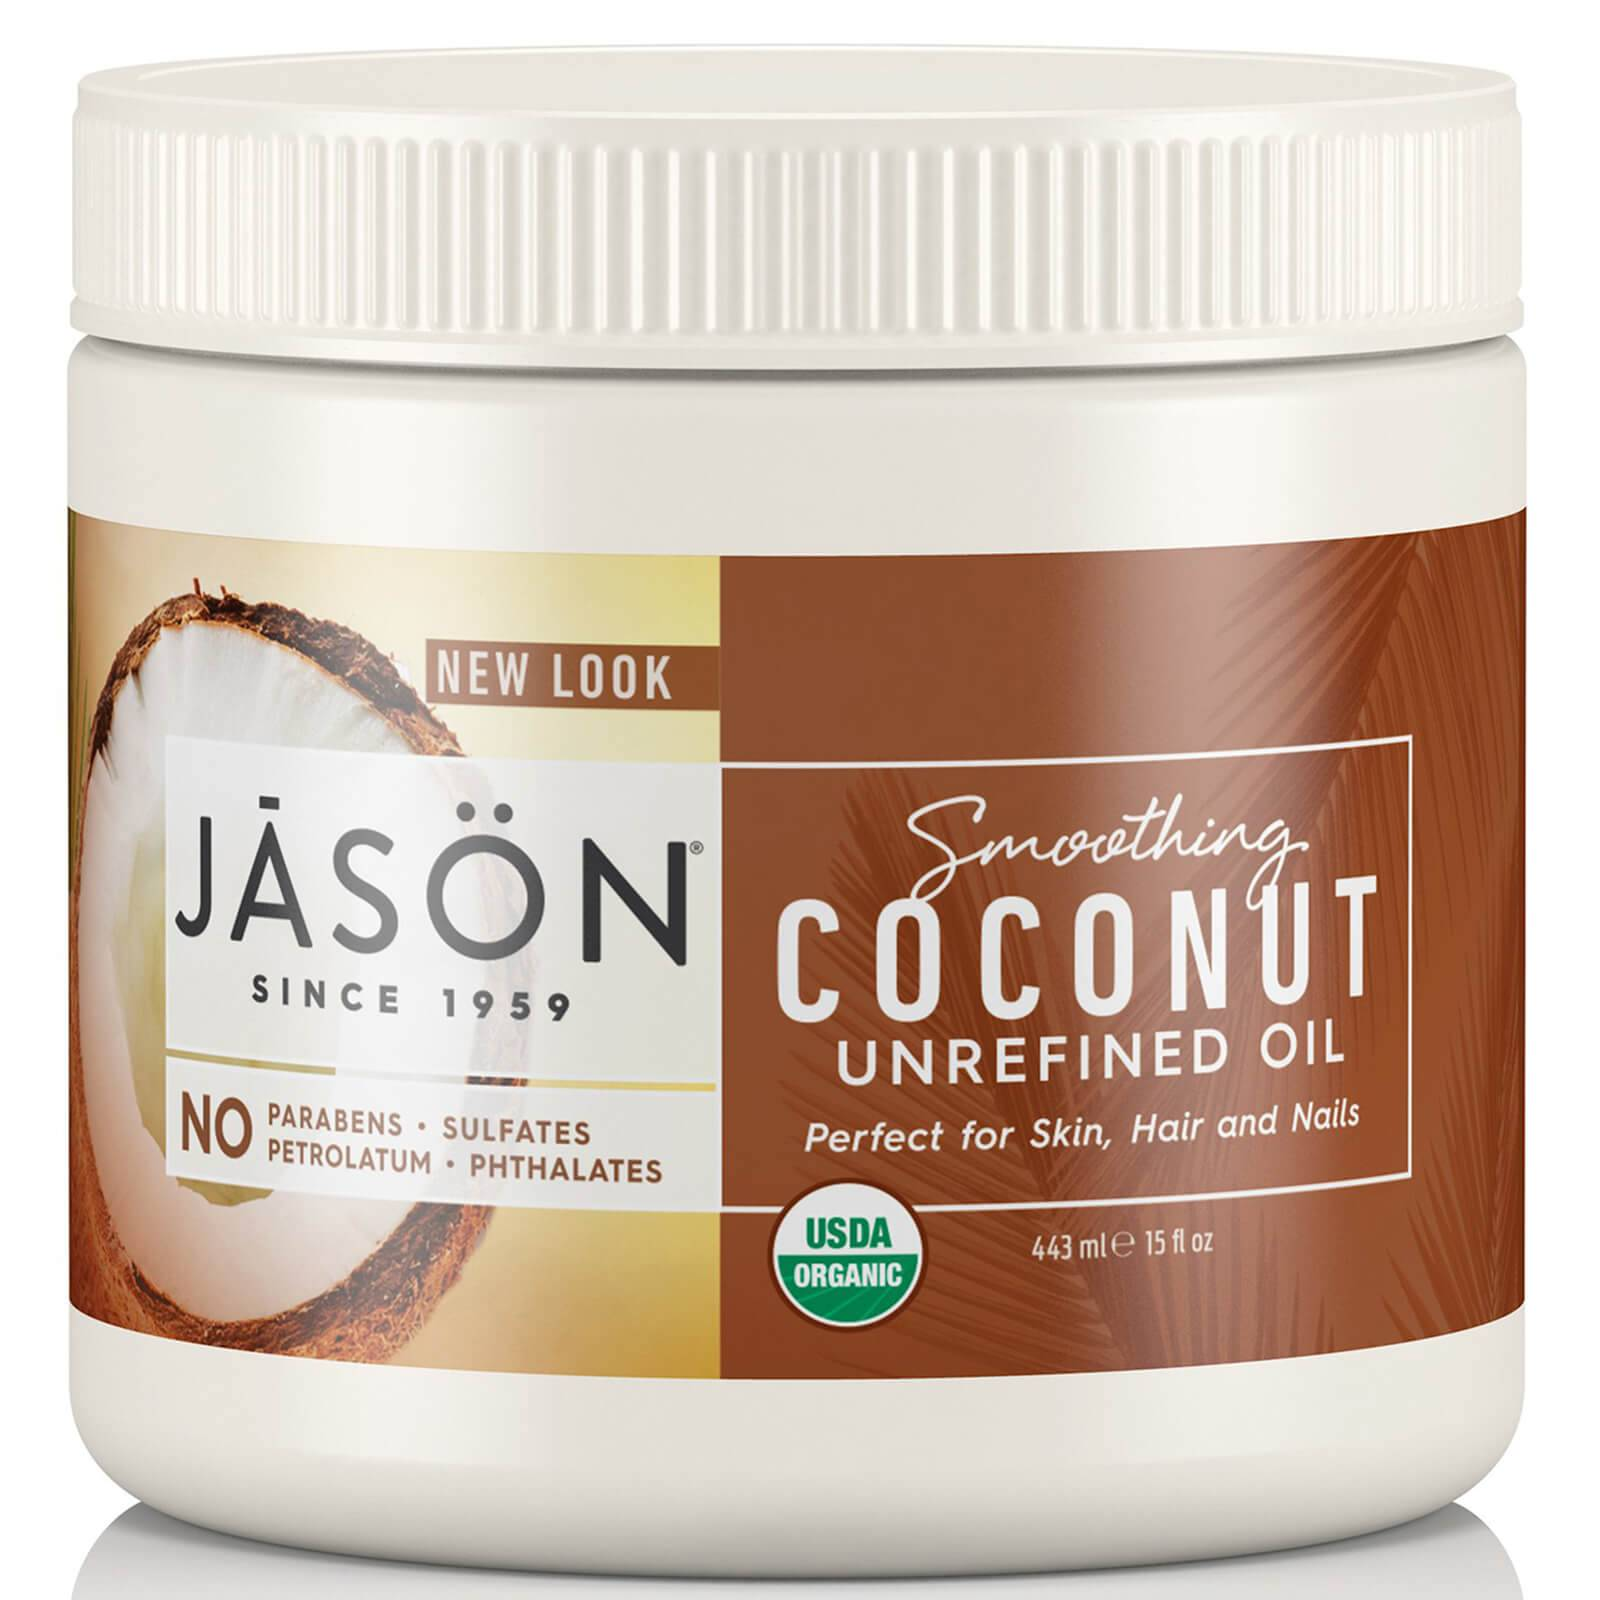 JASON Huille de noix de coco adoucissante bio de JASON443ml